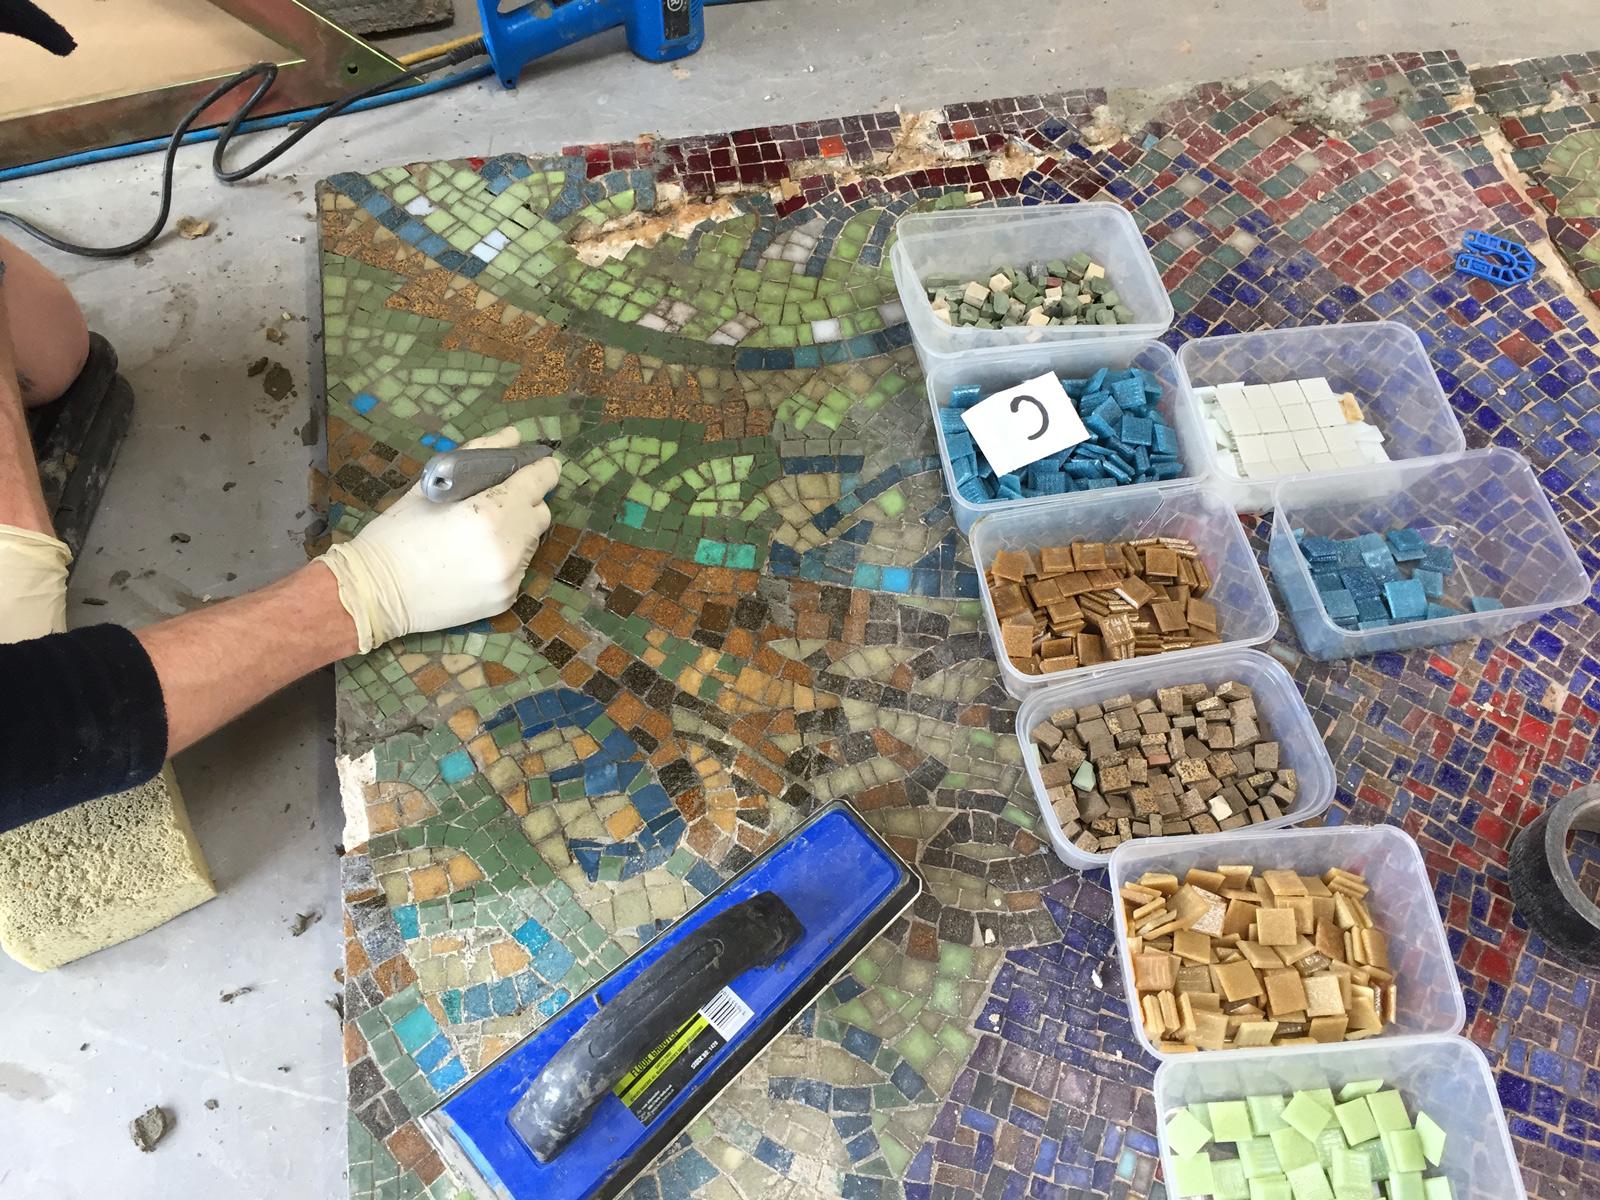 leeds-college-of-art-2015-mosaic-working